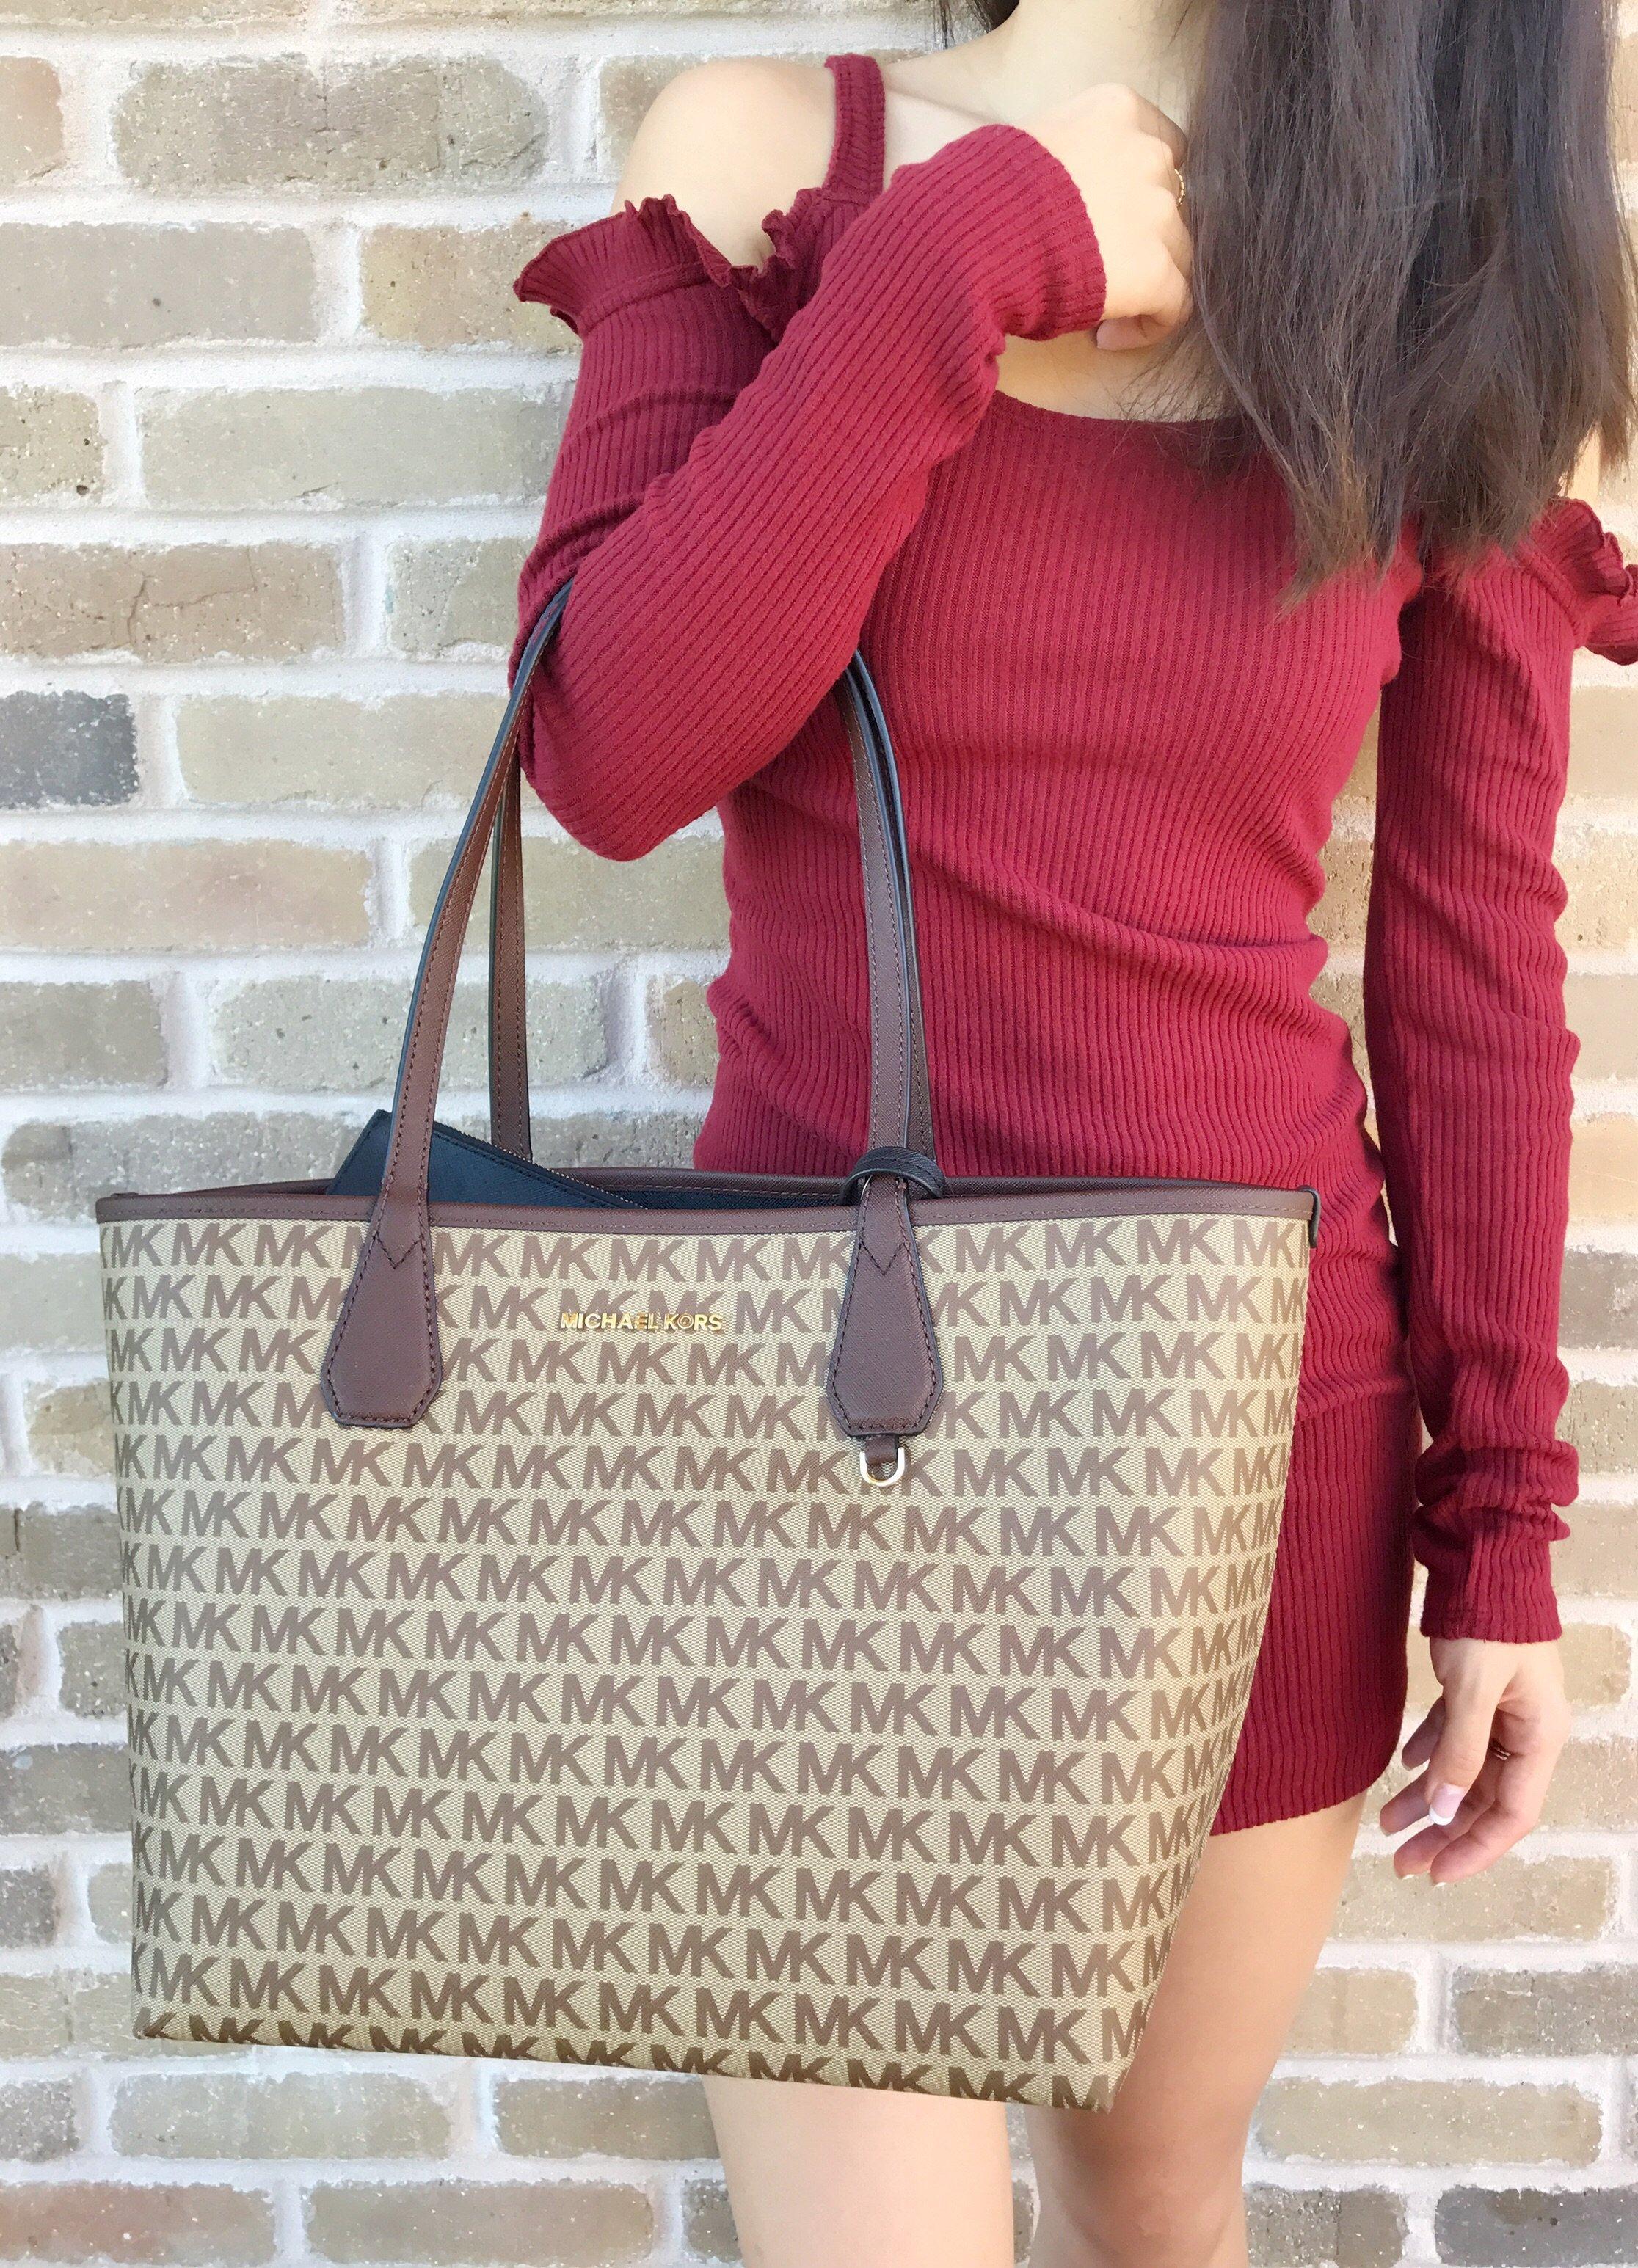 michael kors handbags outlet factory location ga michael kors vanilla tote ebay